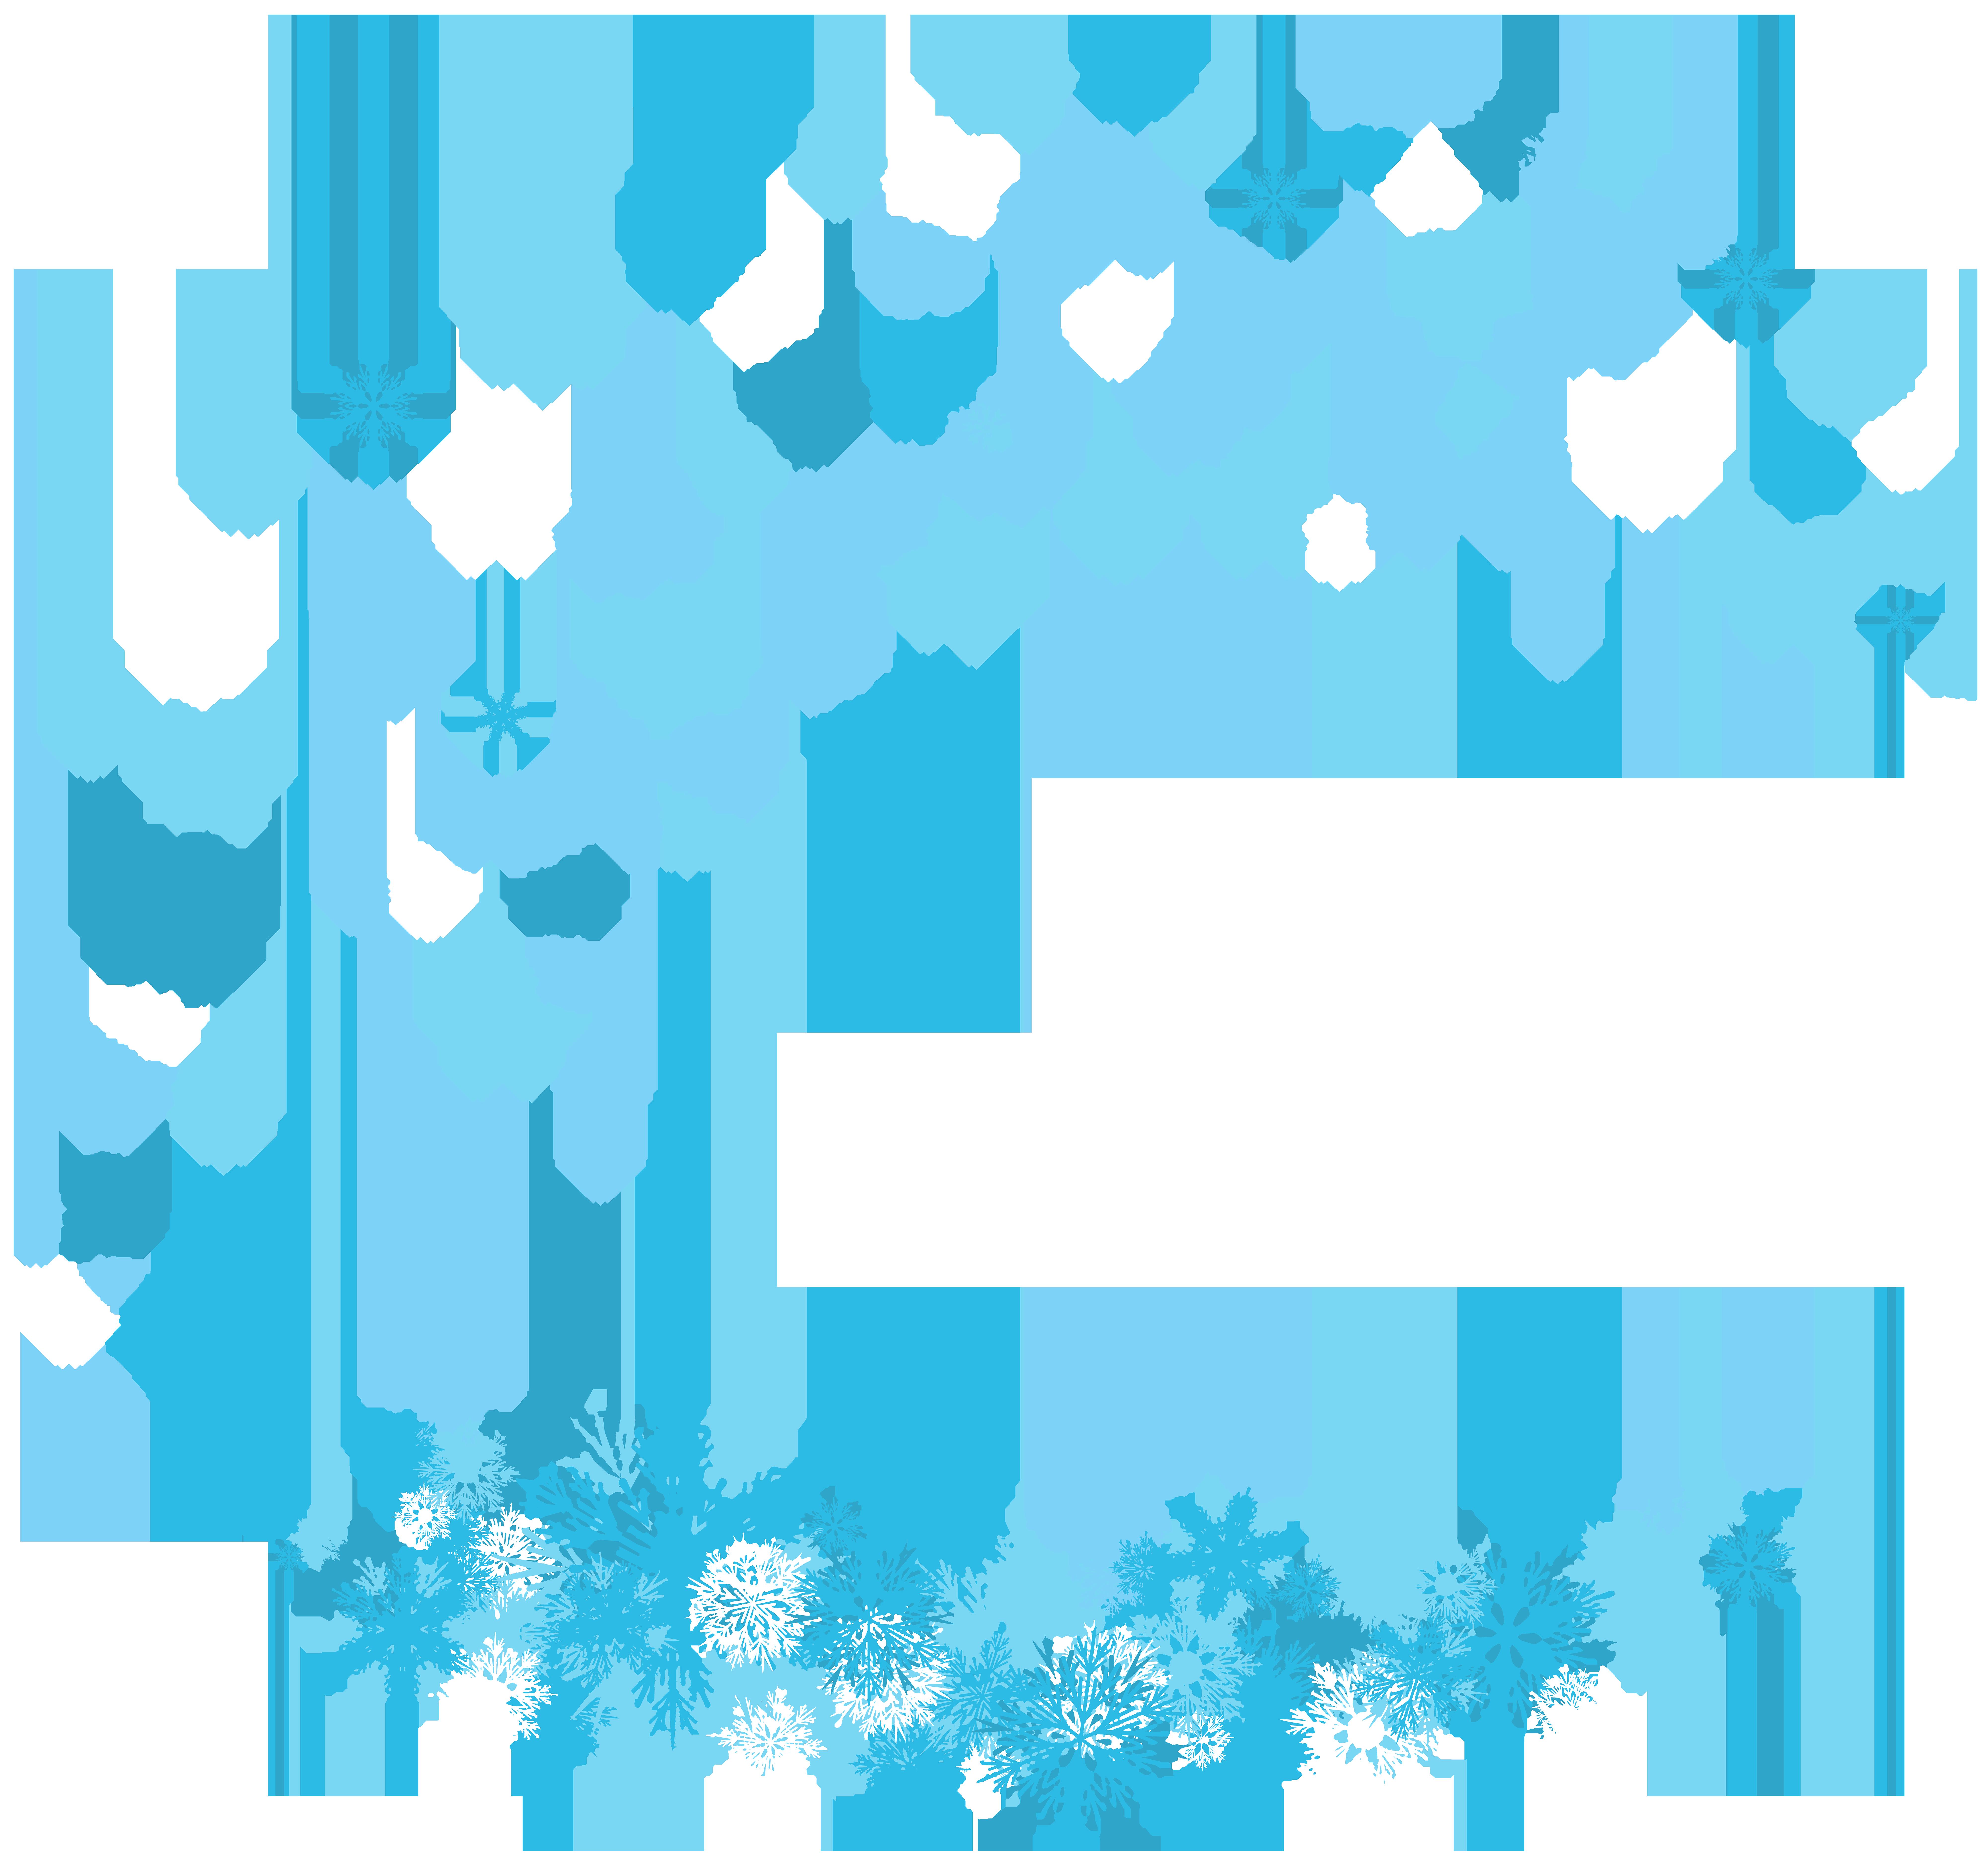 Winter Decoration Snowflakes PNG Clip Art Image.